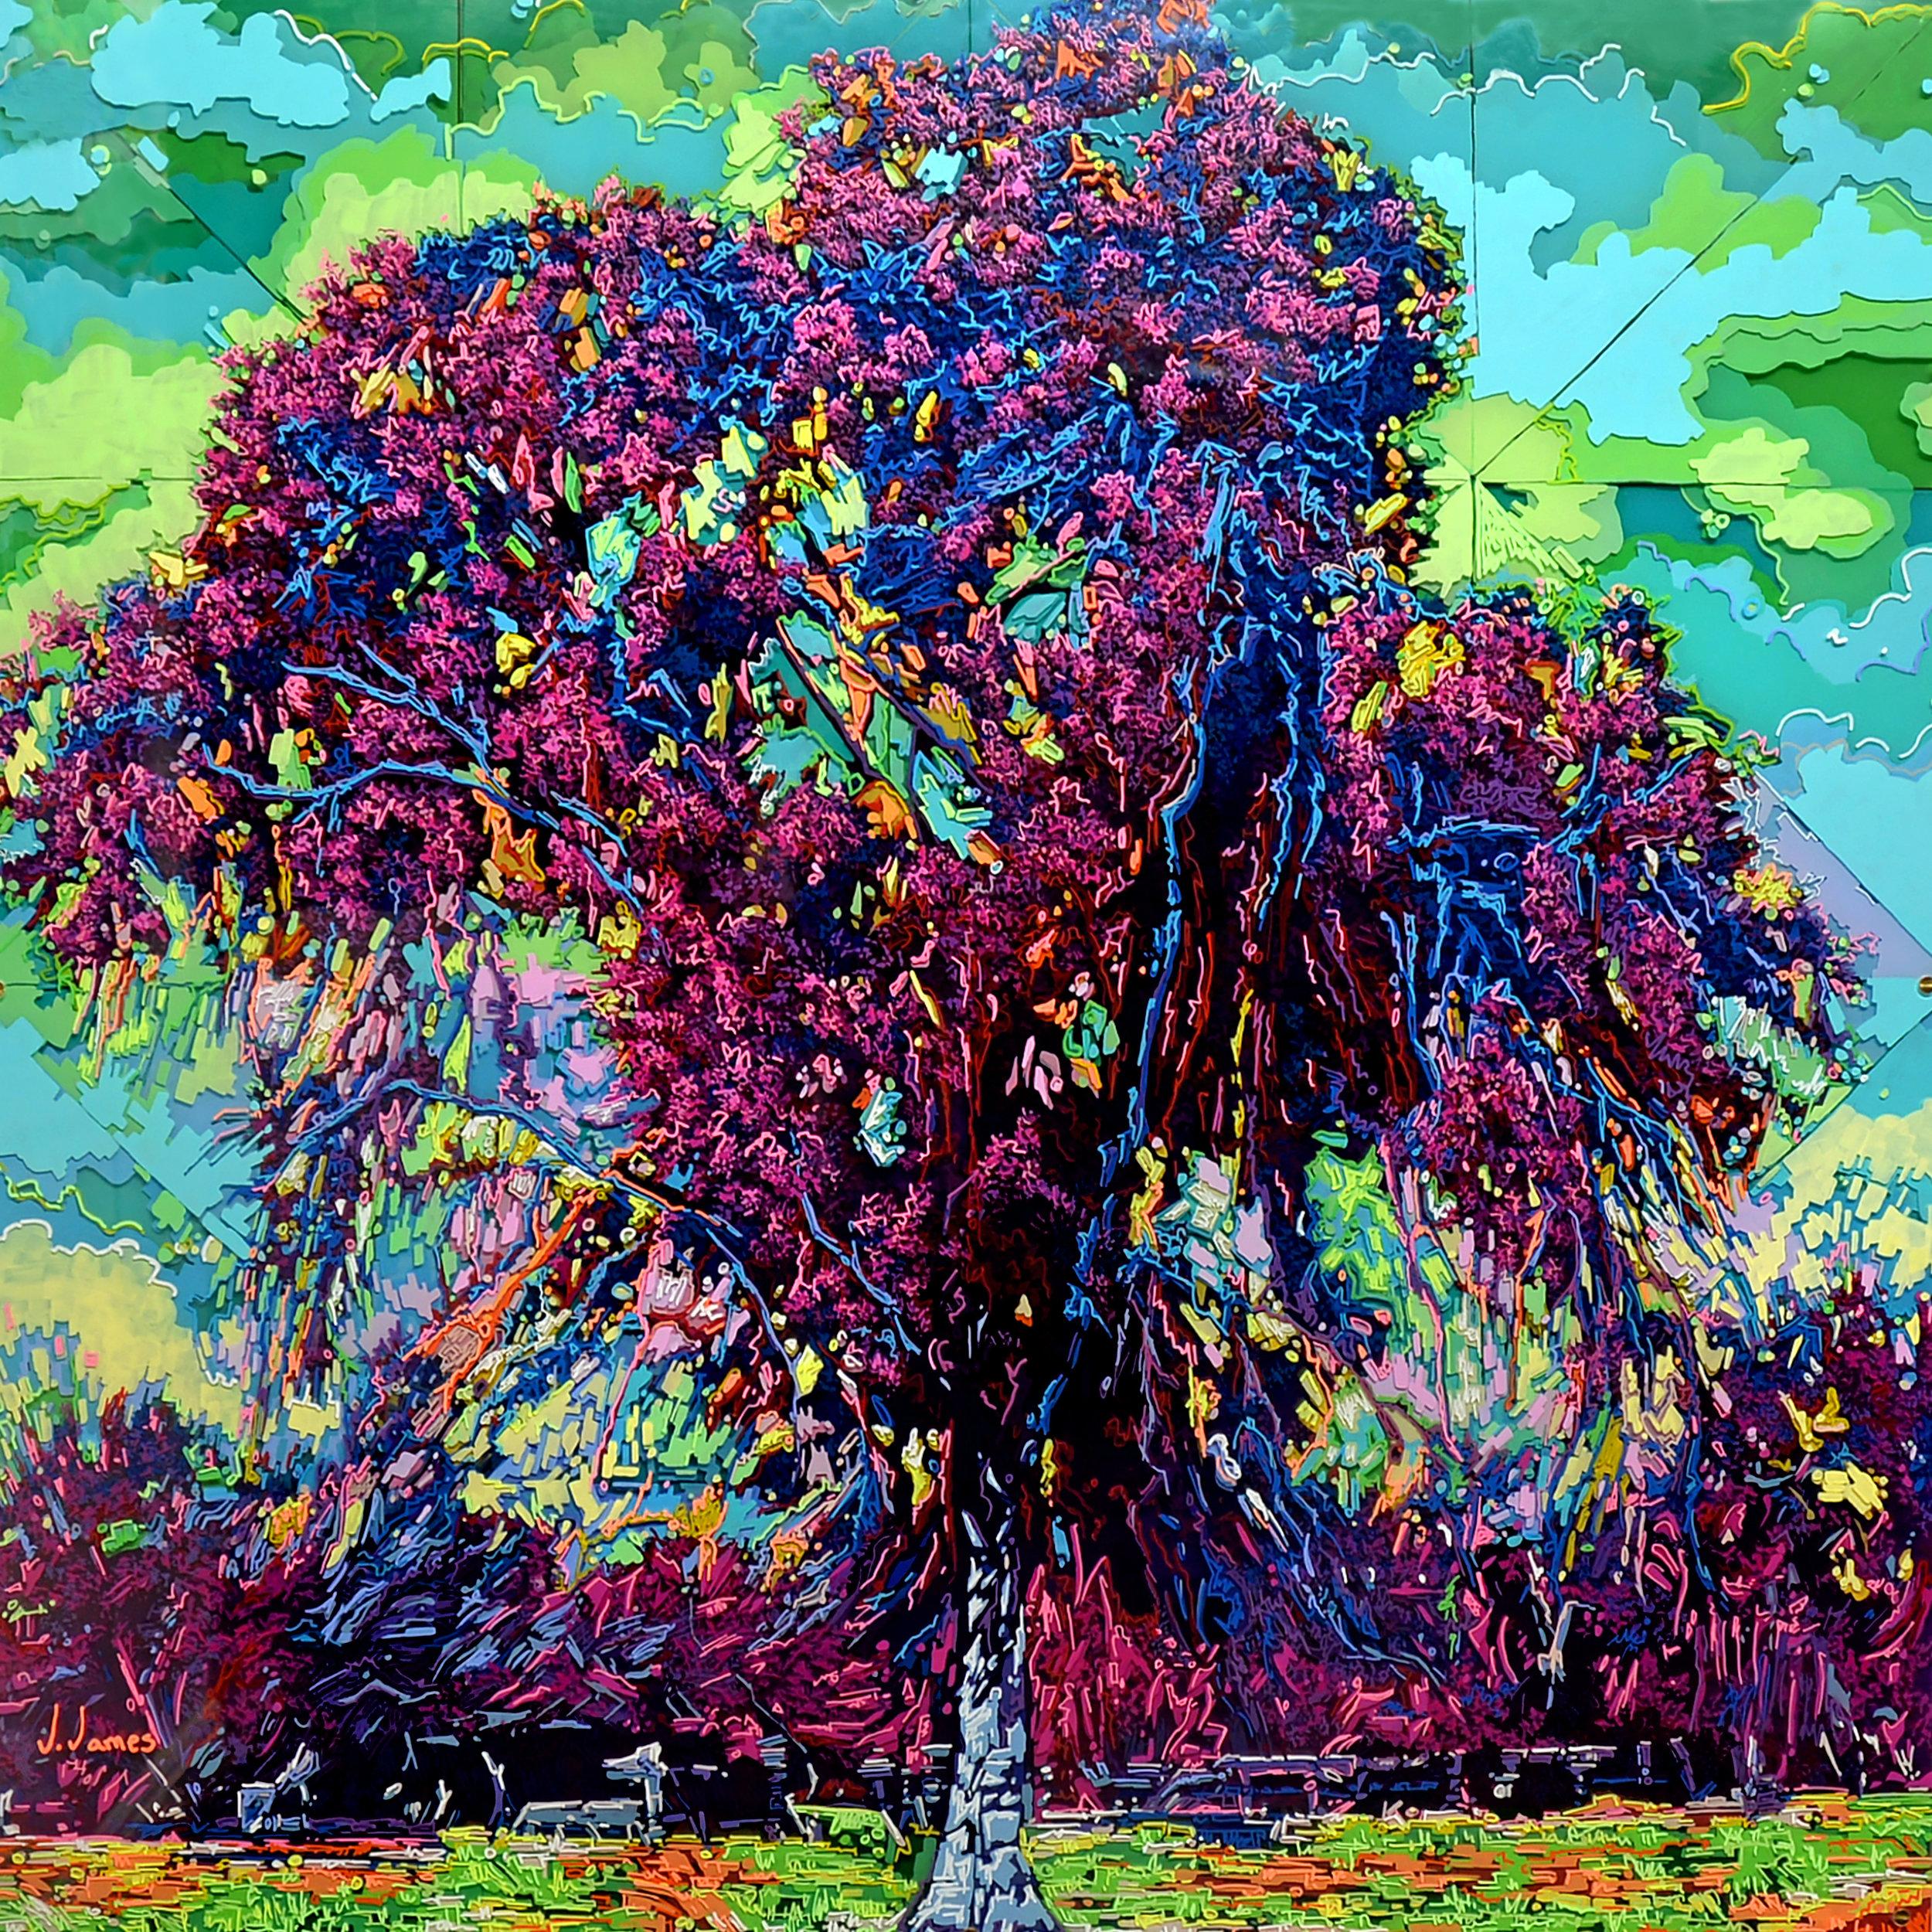 Kingpin 36 x 36 acrylic best image.jpg